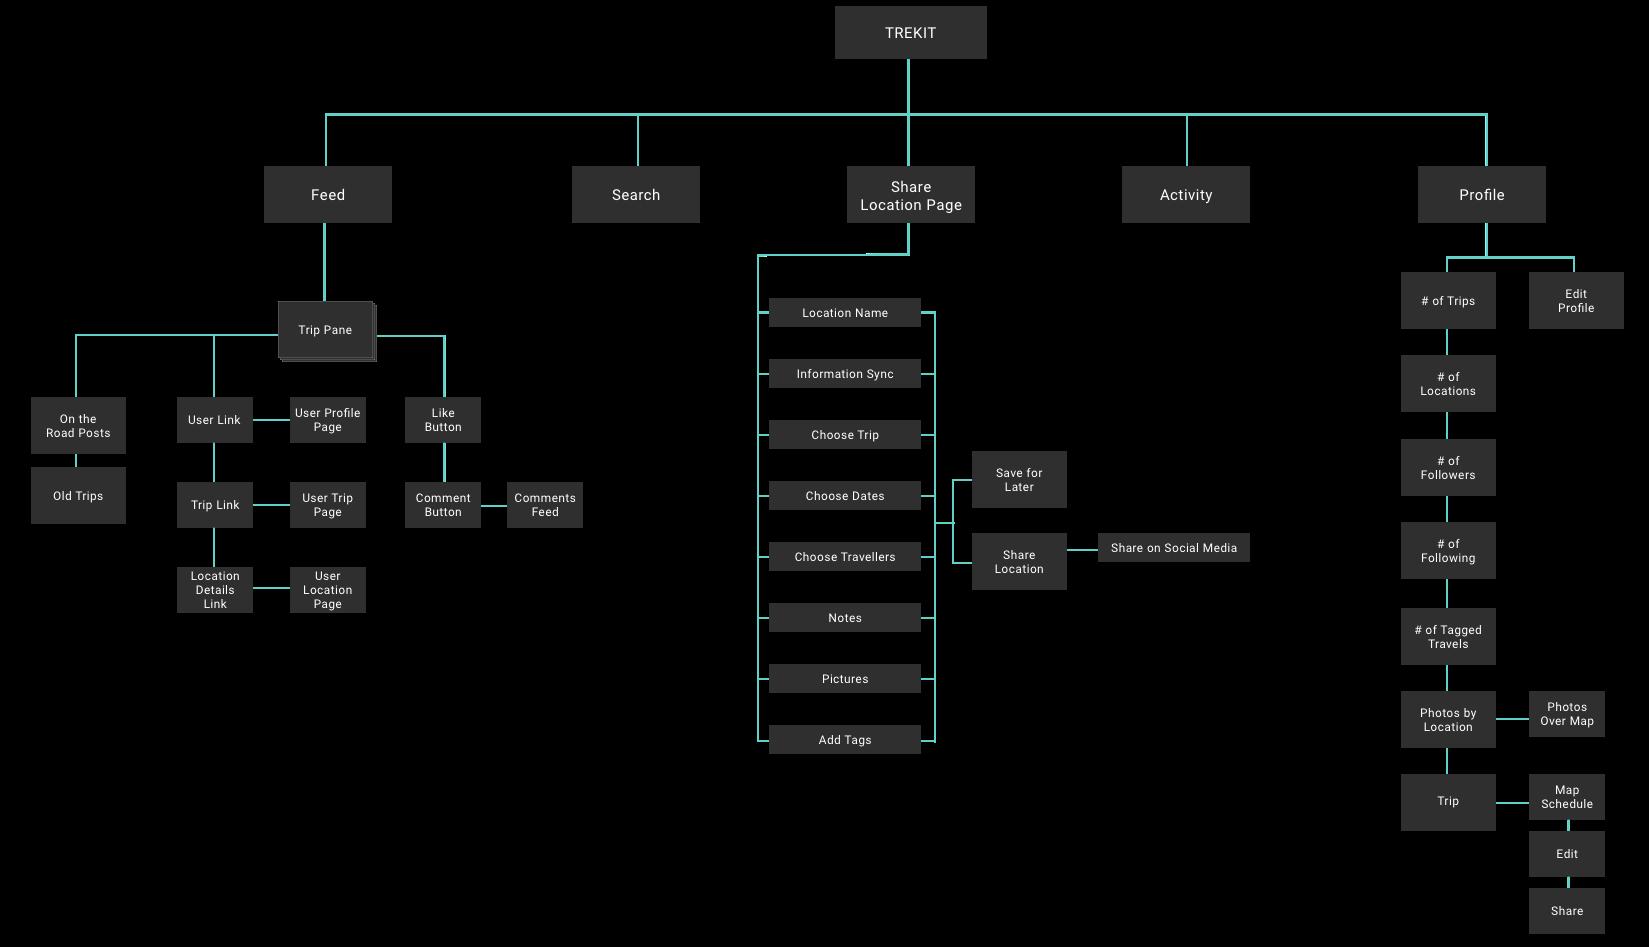 TrekitSitemap.png